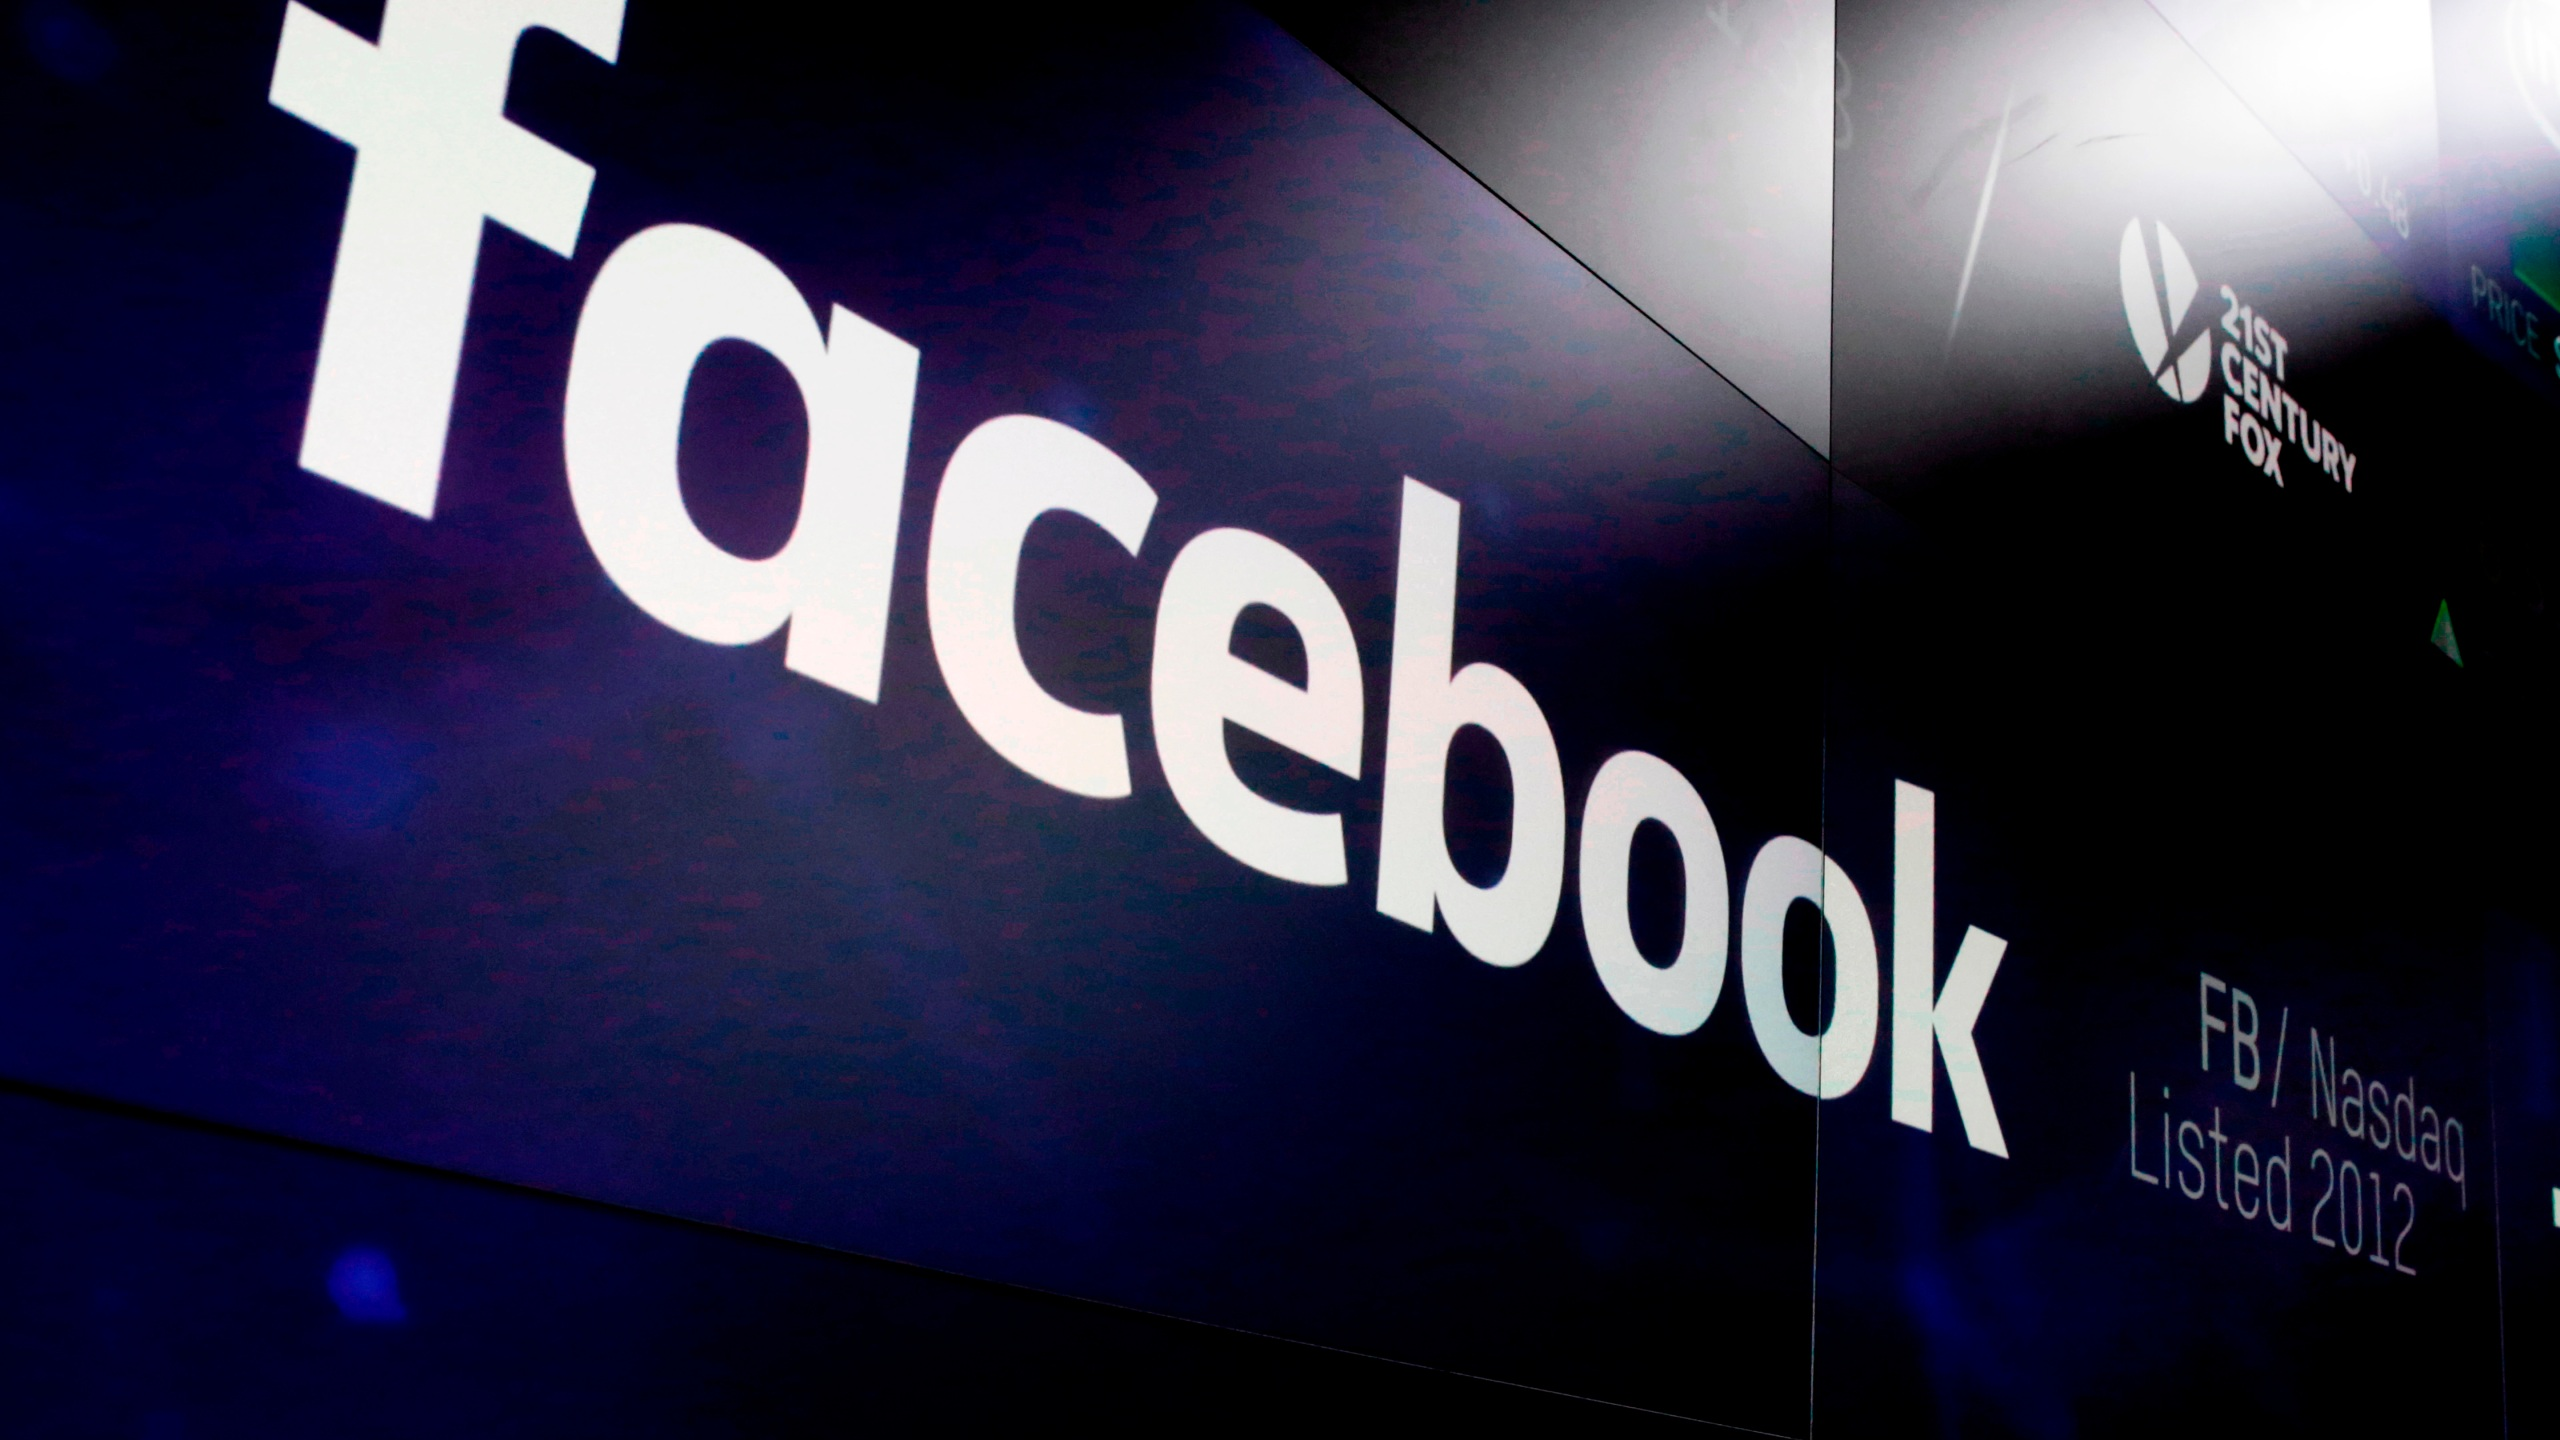 Facebook_Ads_Transparency_69130-159532.jpg20697910